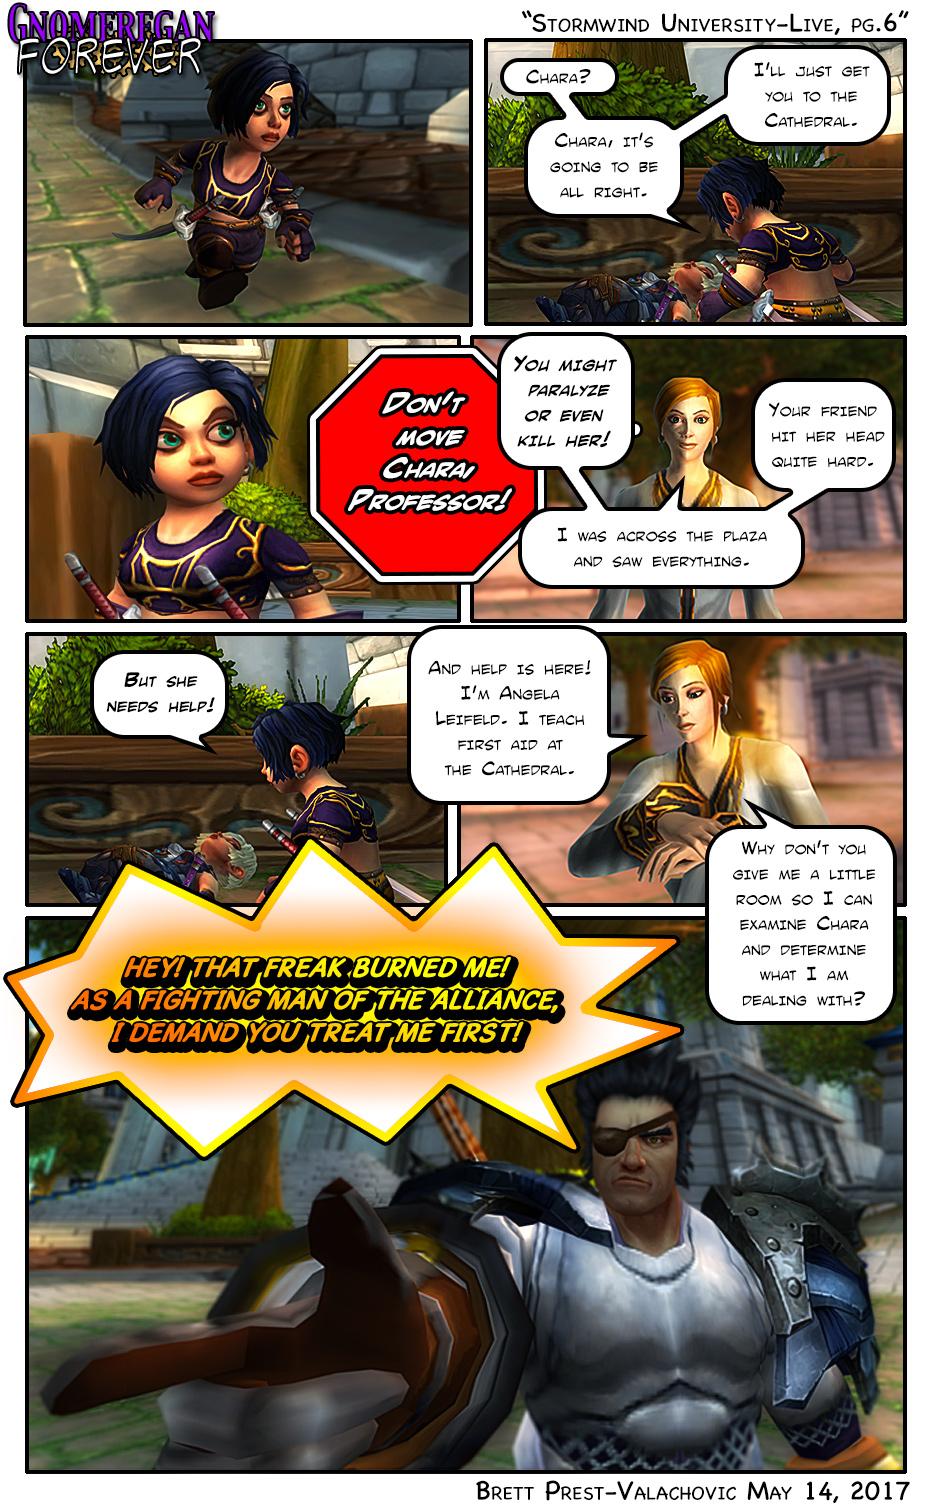 Stormwind University Live, pg.6